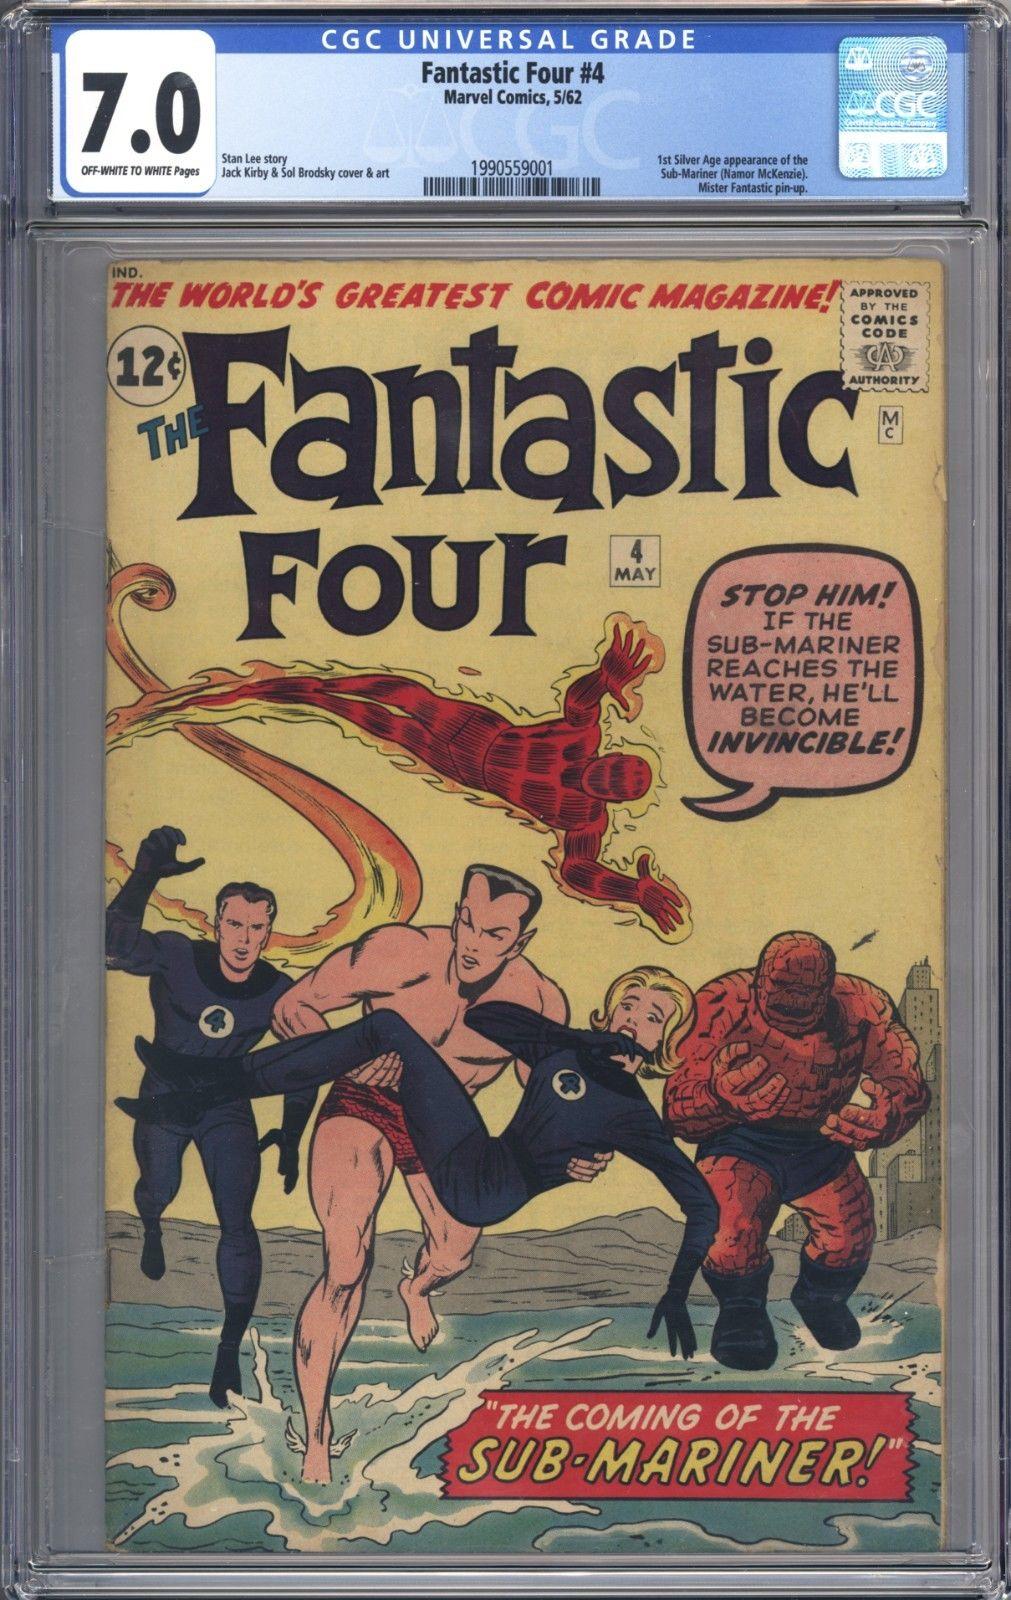 Fantastic Four #4 Vol 1 CGC 7.0 Beautiful Higher Grade 1st SA App of Sub-Mariner